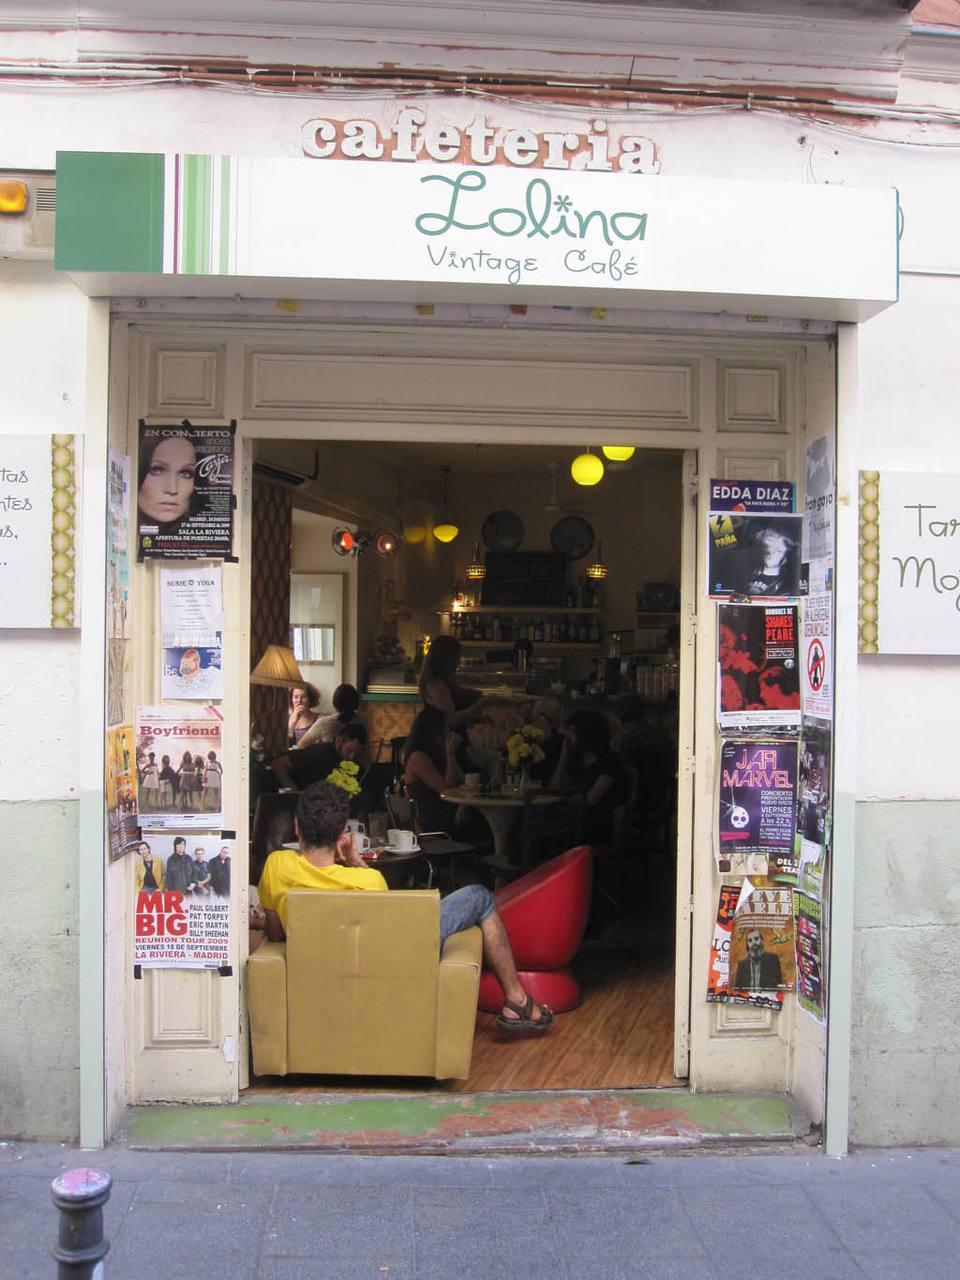 What To Do in Madrid's Malasaña and Chueca Neighborhoods